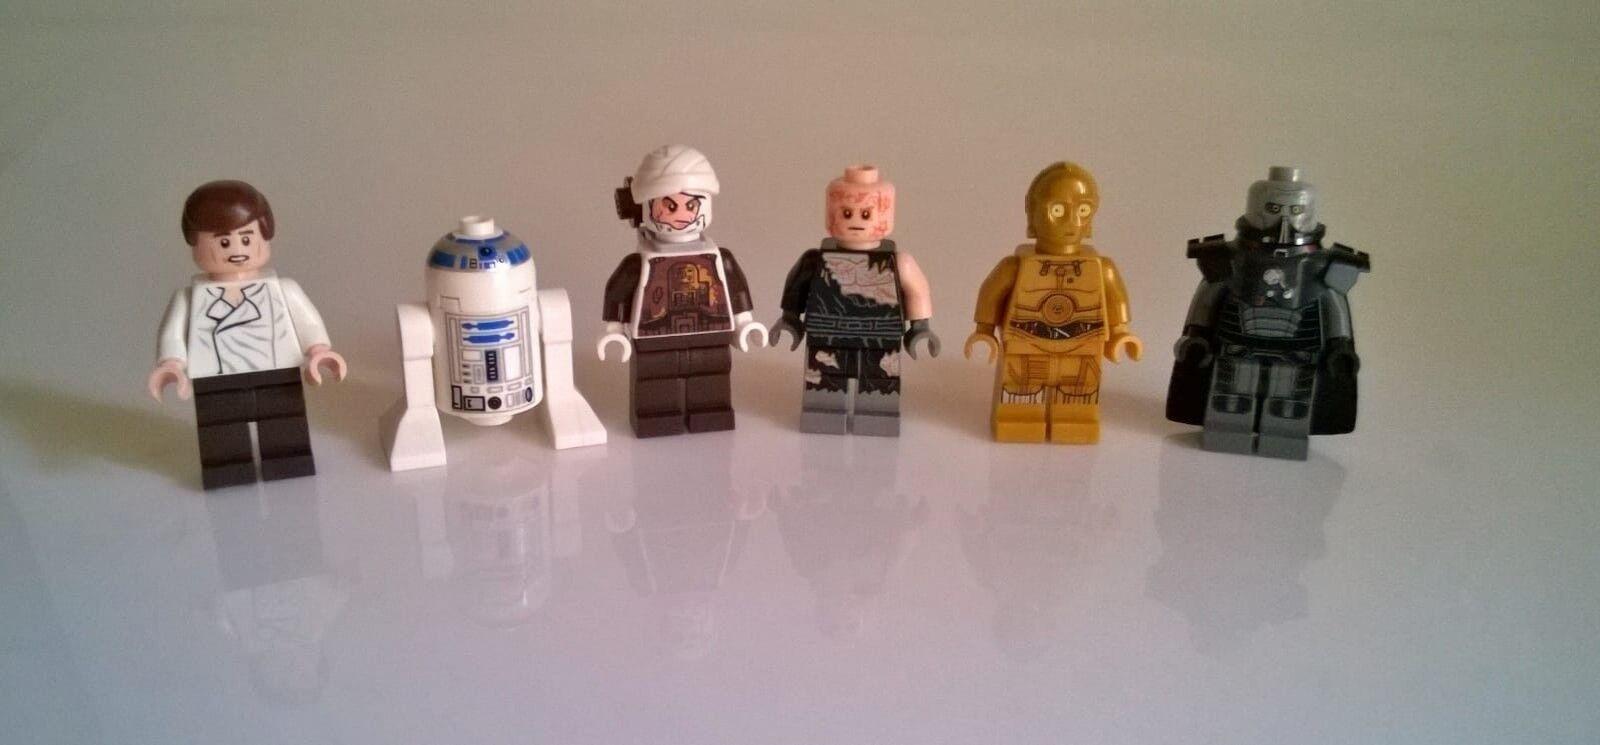 LEGO Star Wars Personaggi Darth malgus Anakin han solo Dengar c-3po r2-d2